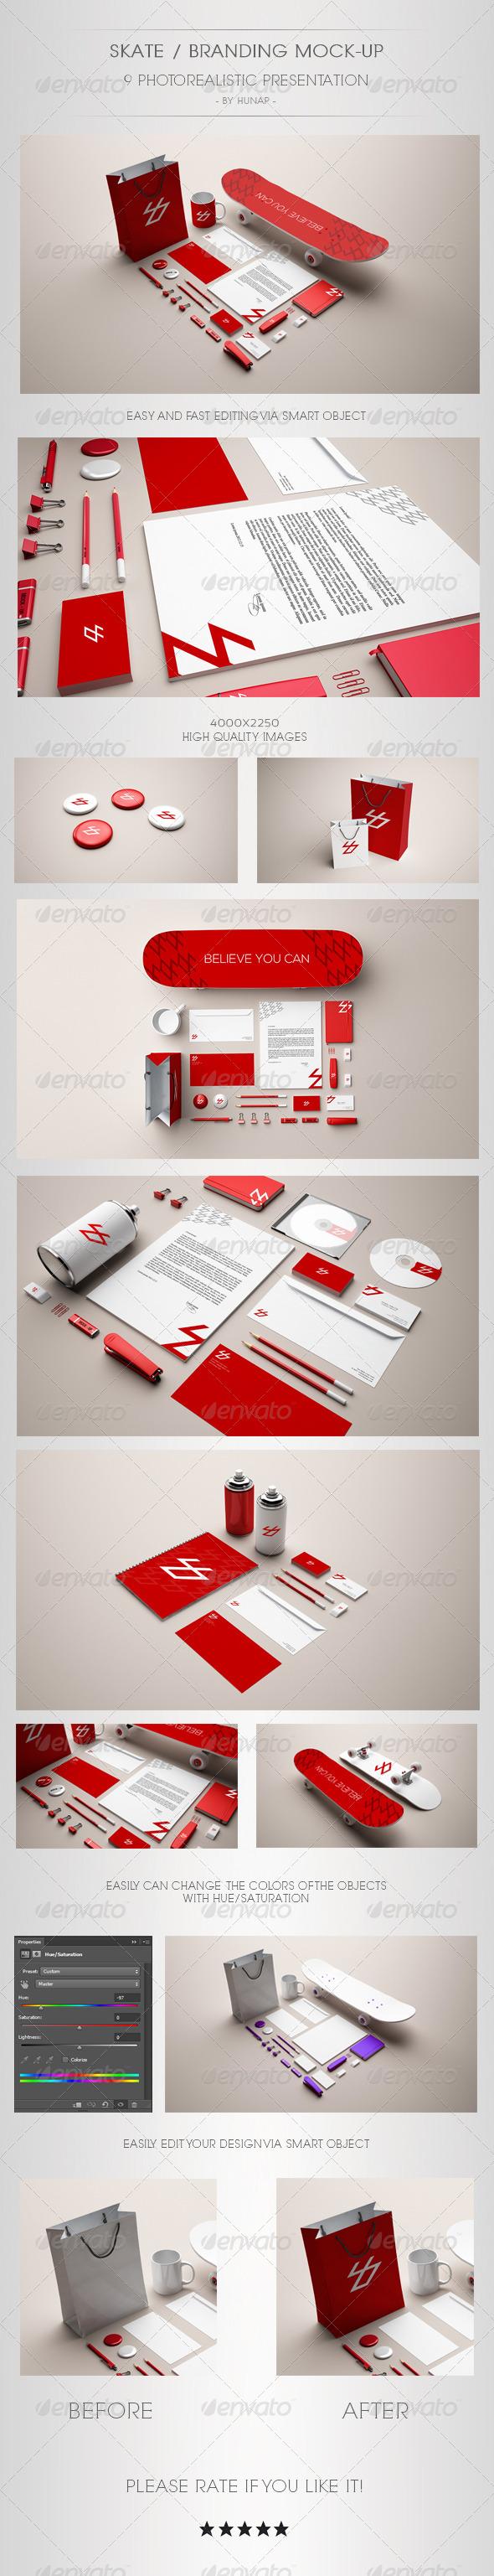 GraphicRiver Skate Stationery Branding Mock Up 6770654